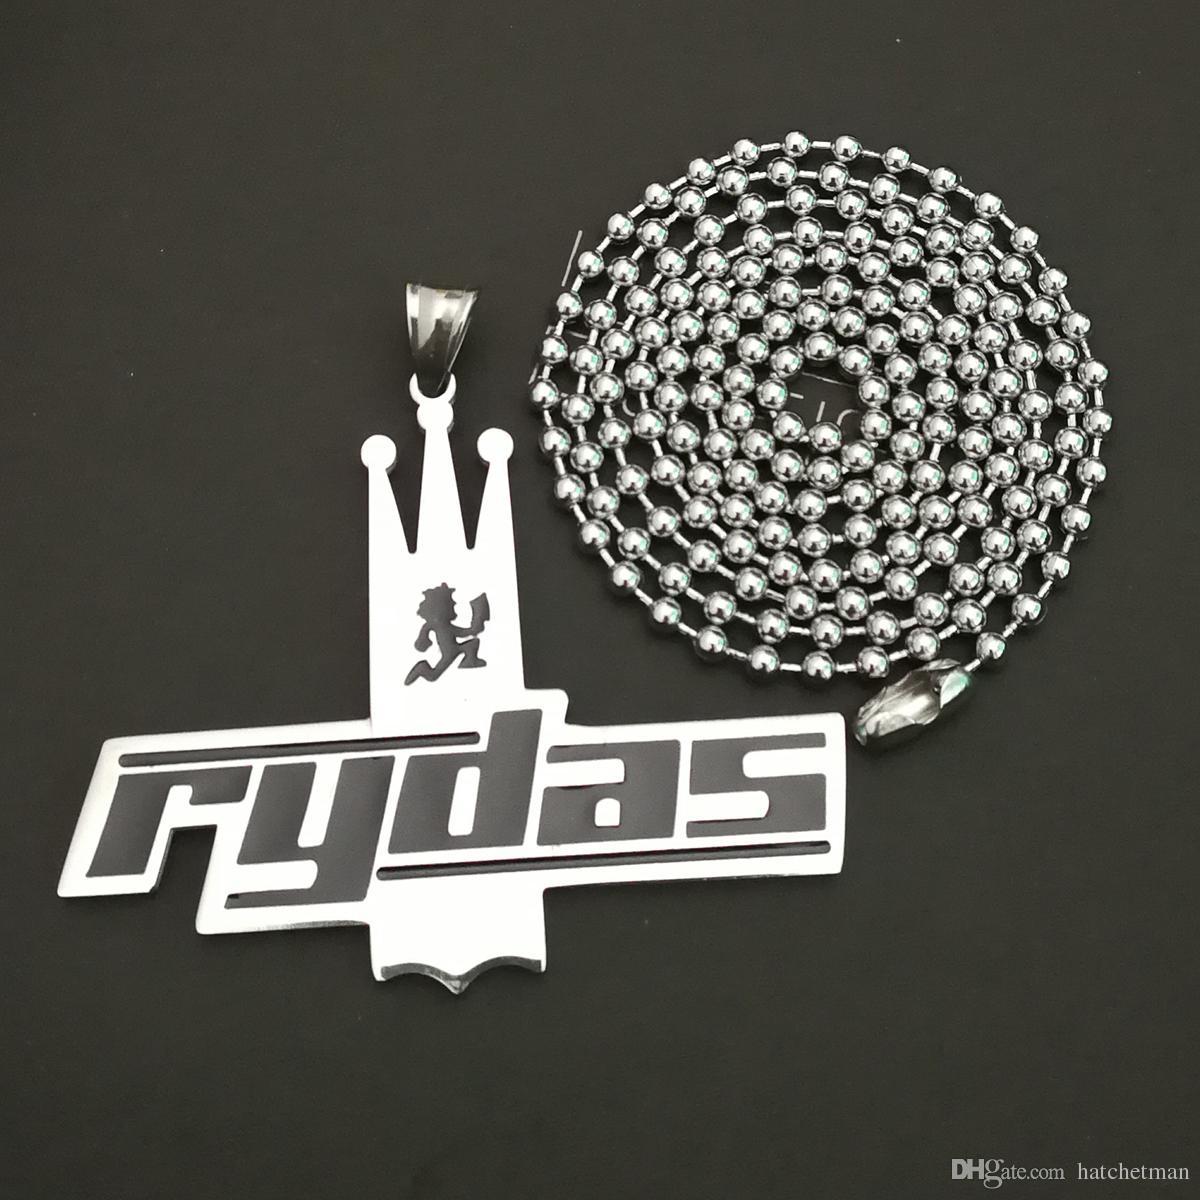 Cool Psychopathic Rydas nero Crown Charm Pendant ICP Twiztid / 30 '' Ball neckalce High polish Può essere personalizzato charm